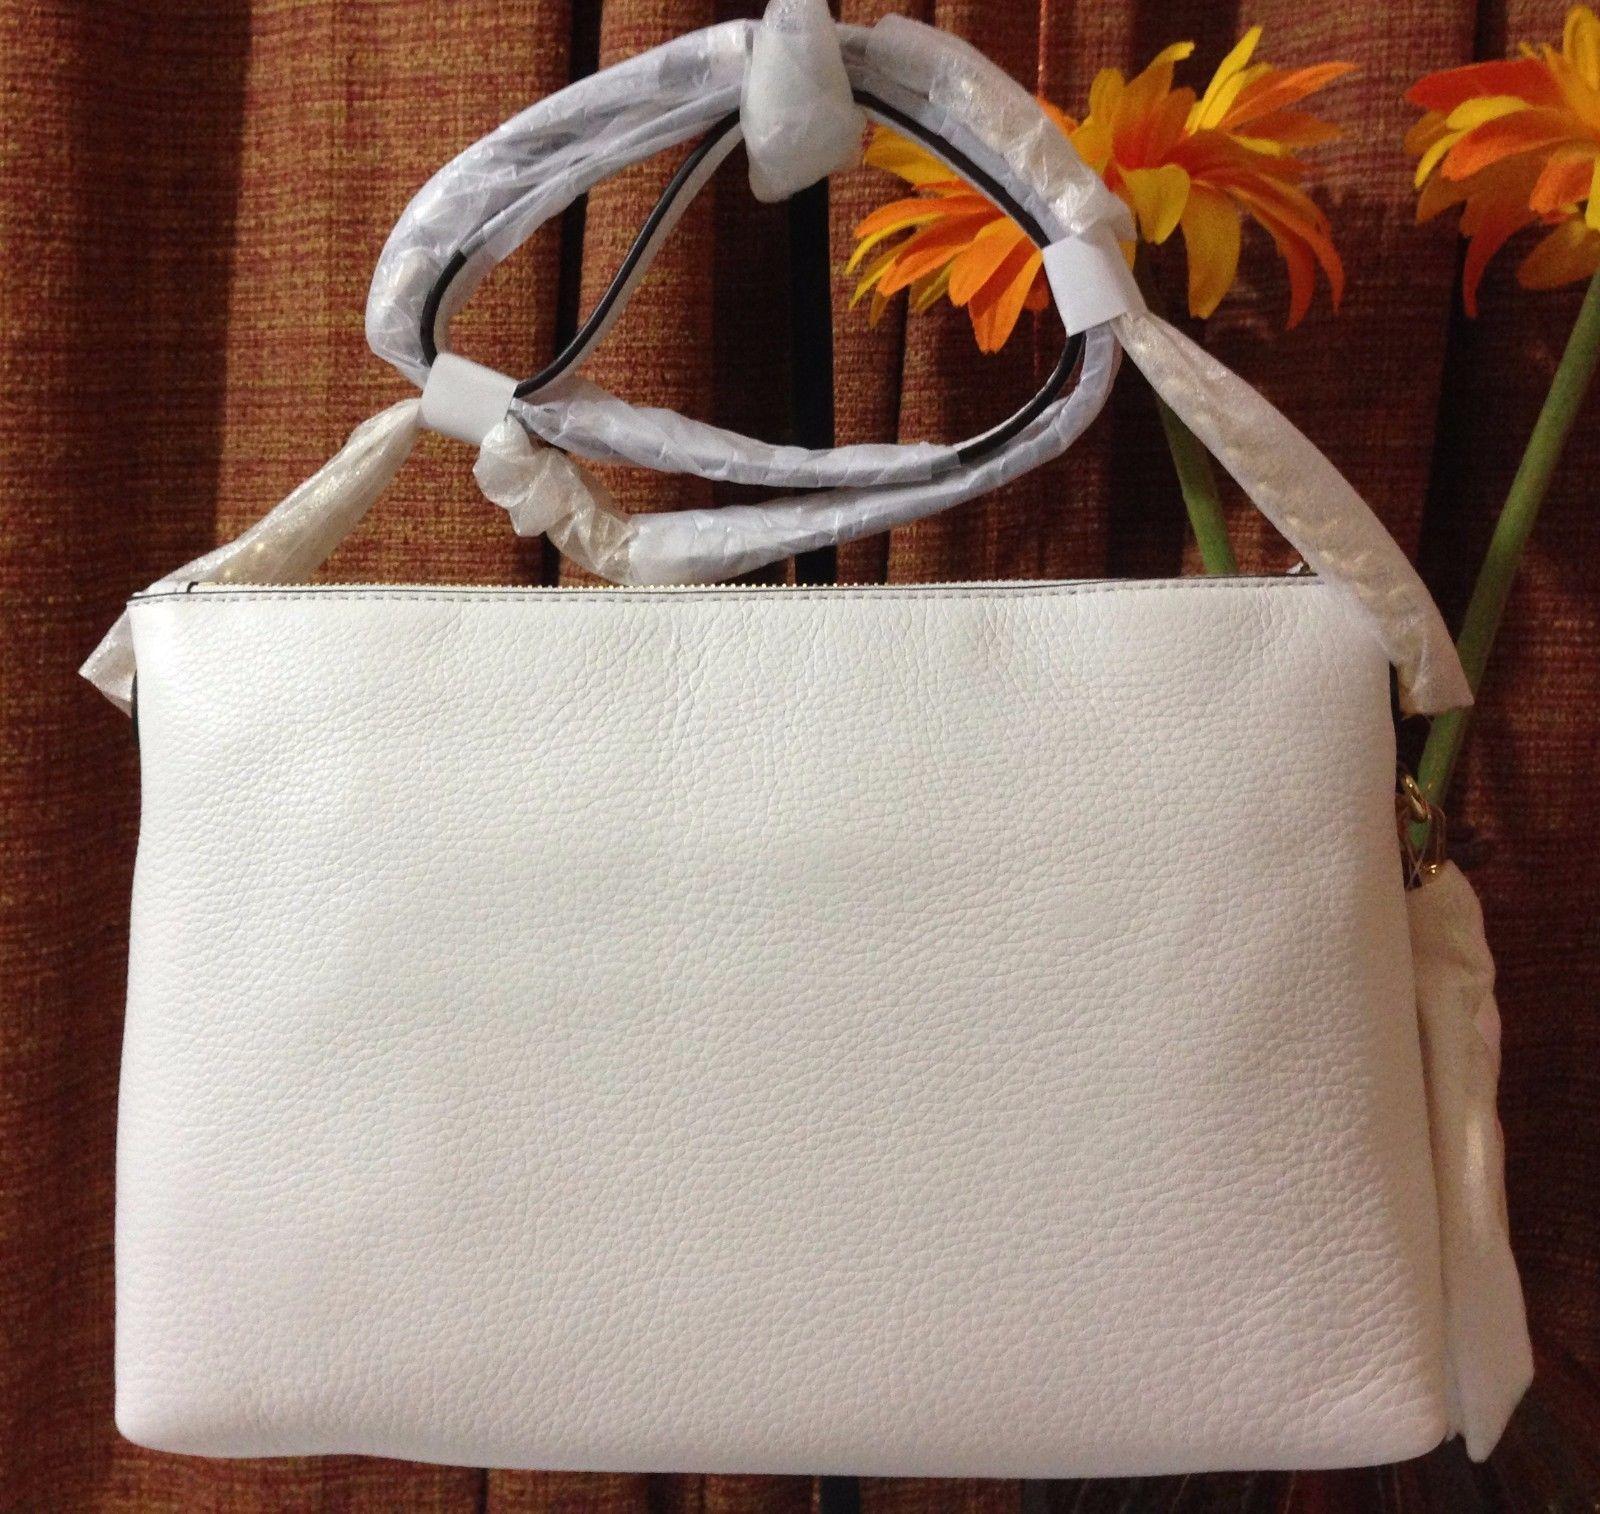 NWT Michael Kors JetSet Chain TopZip Messenger/Crossbody Bag Leather Optic White